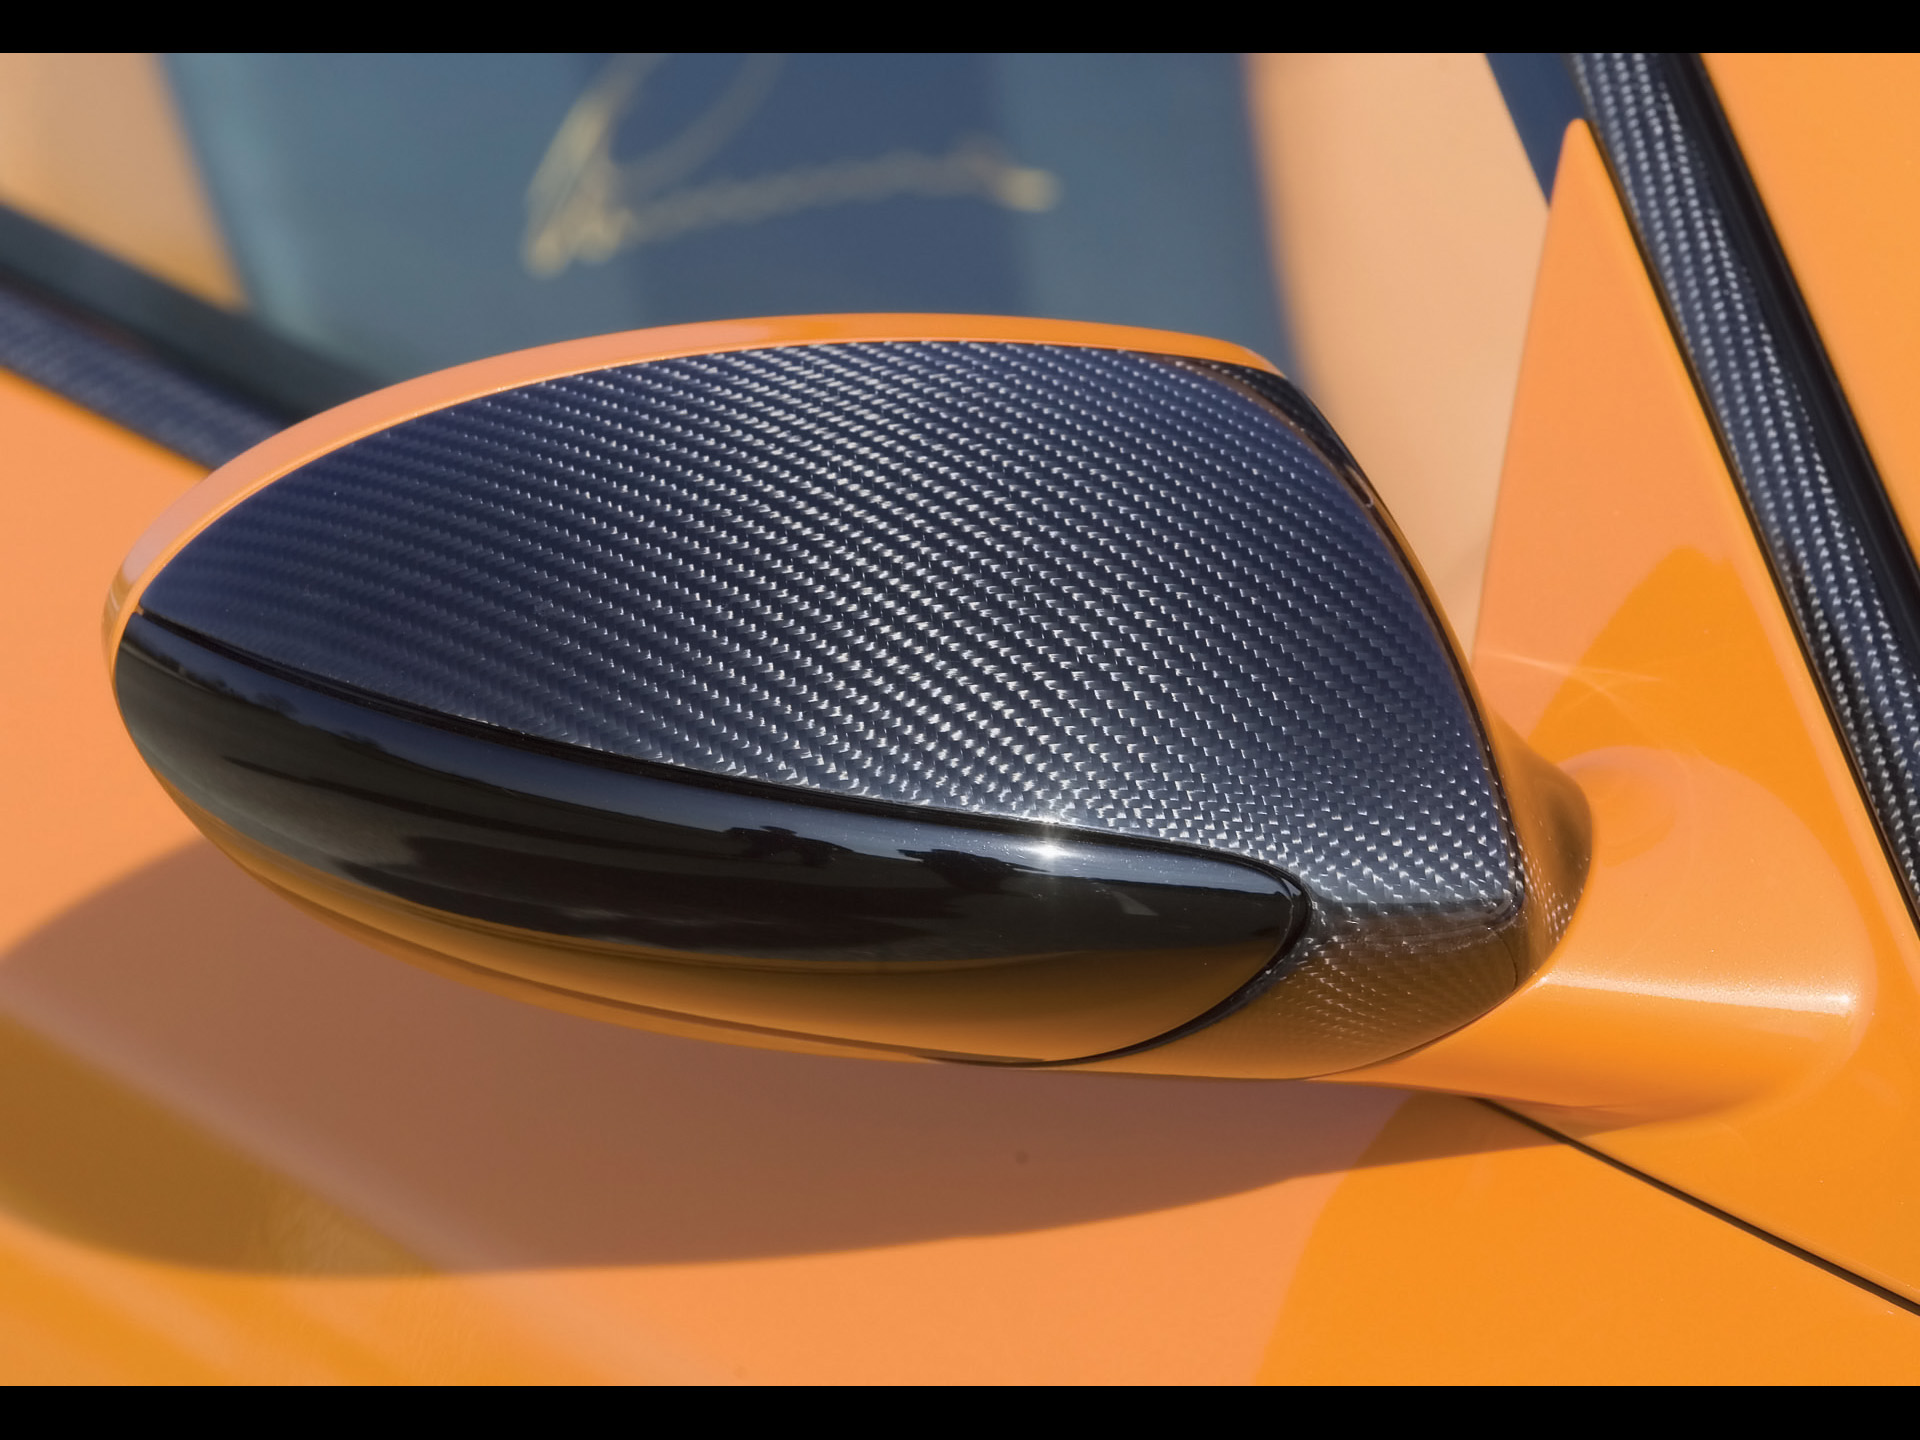 Карбоновая плёнка на автомобильном зеркале